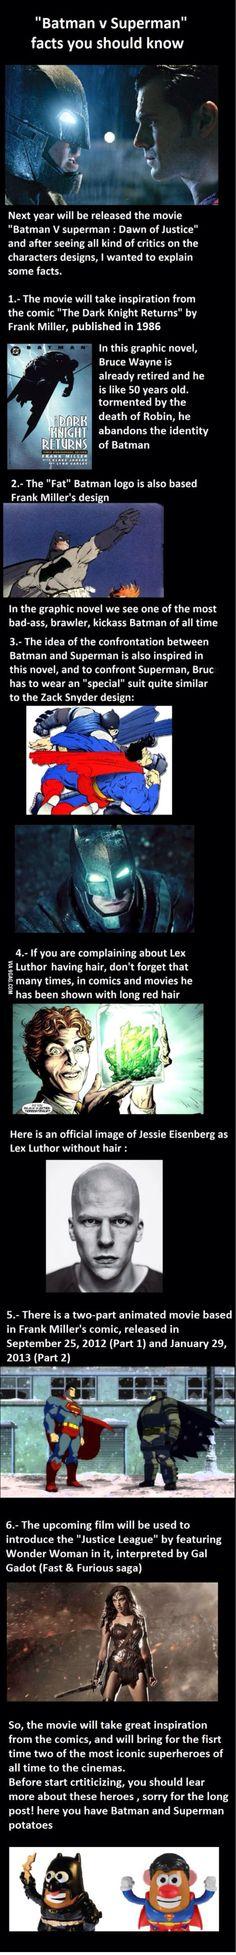 Batman v Superman facts you should know